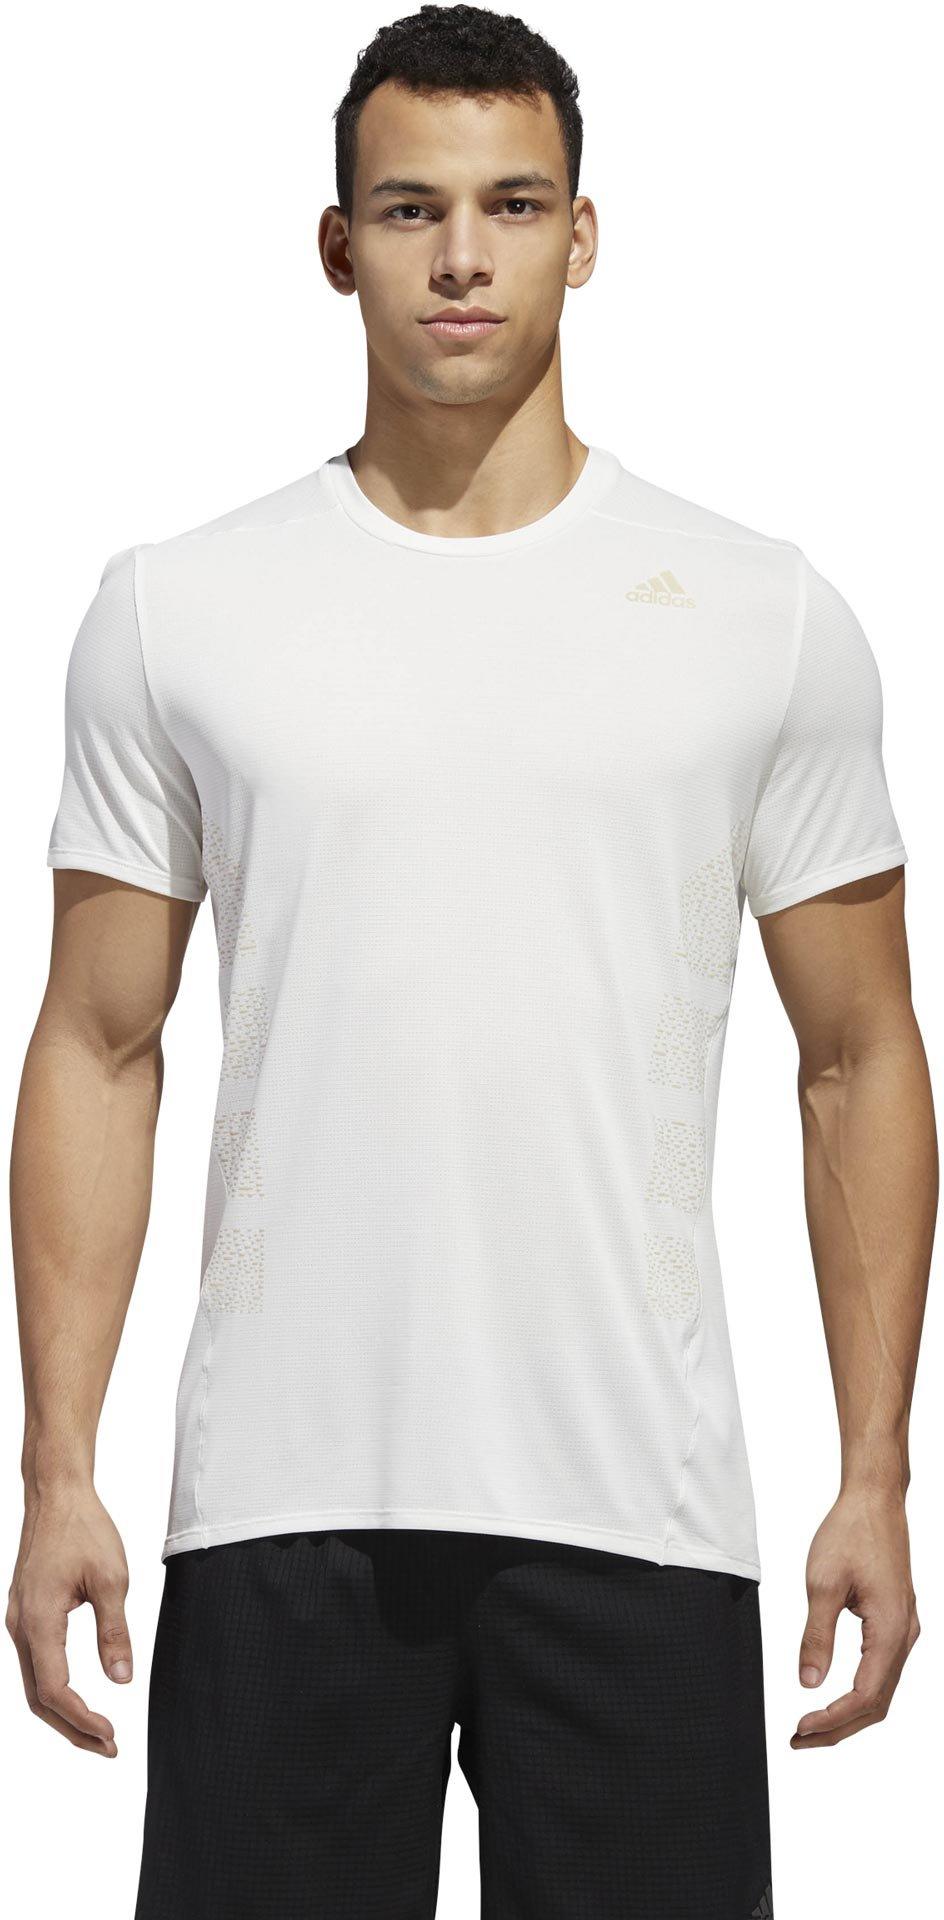 eb691af01a adidas Supernova Short Sleeve Tee Men Reflective S